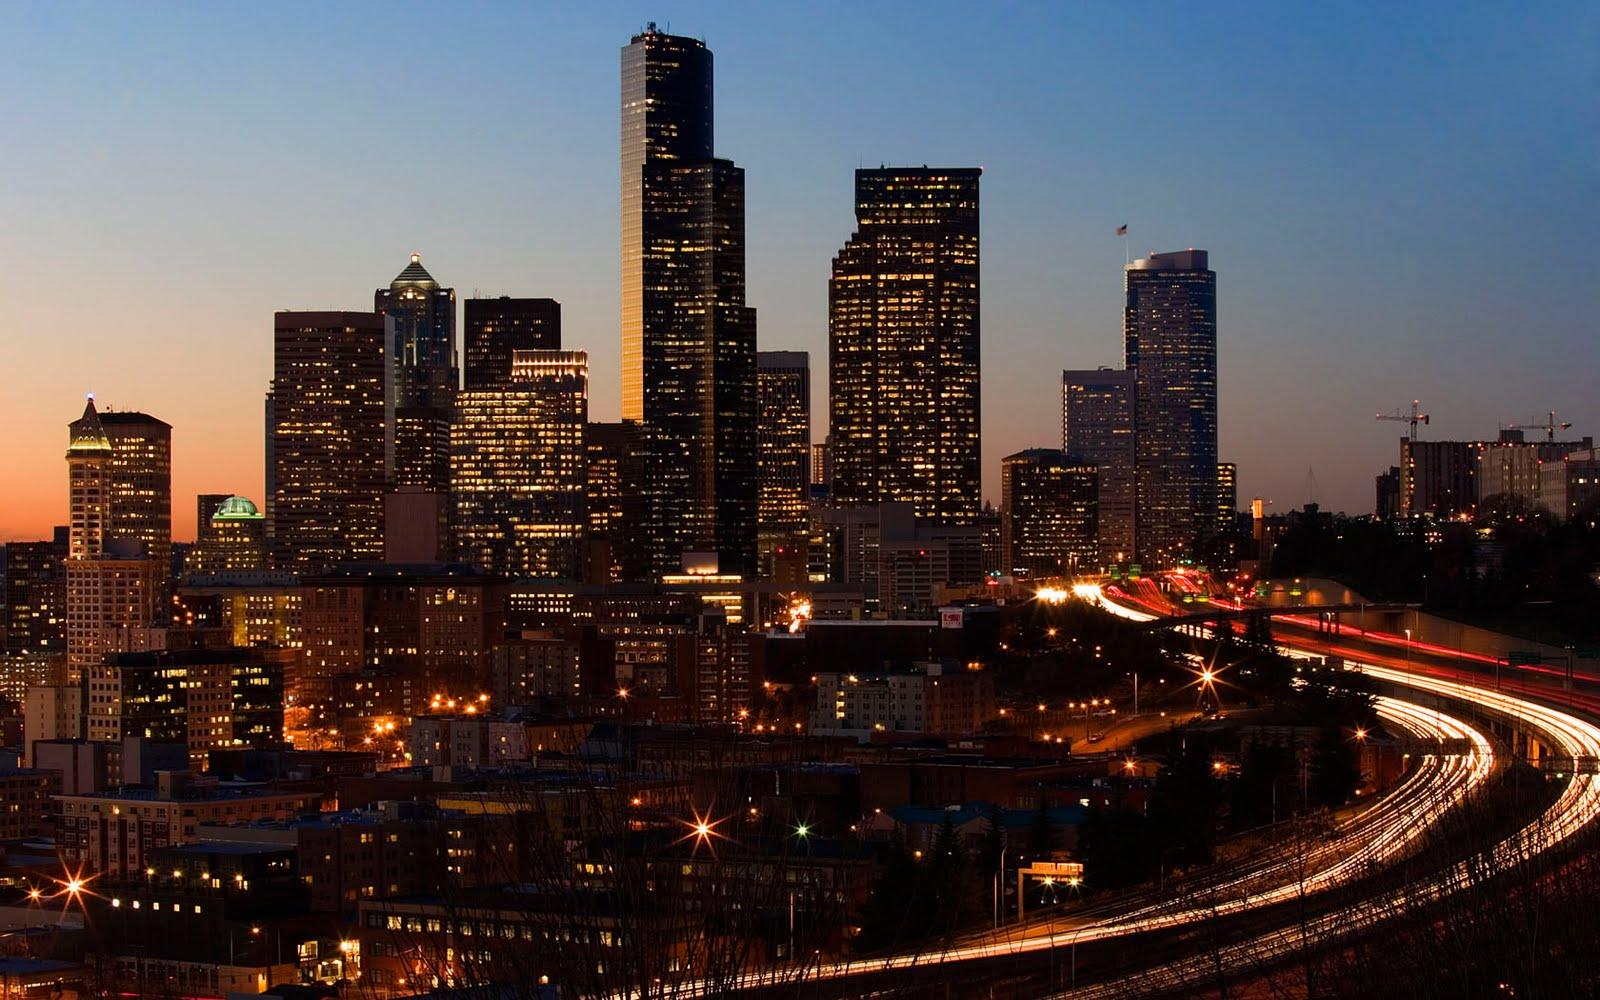 Best Wallpaper: Night City Lights Wallpapers